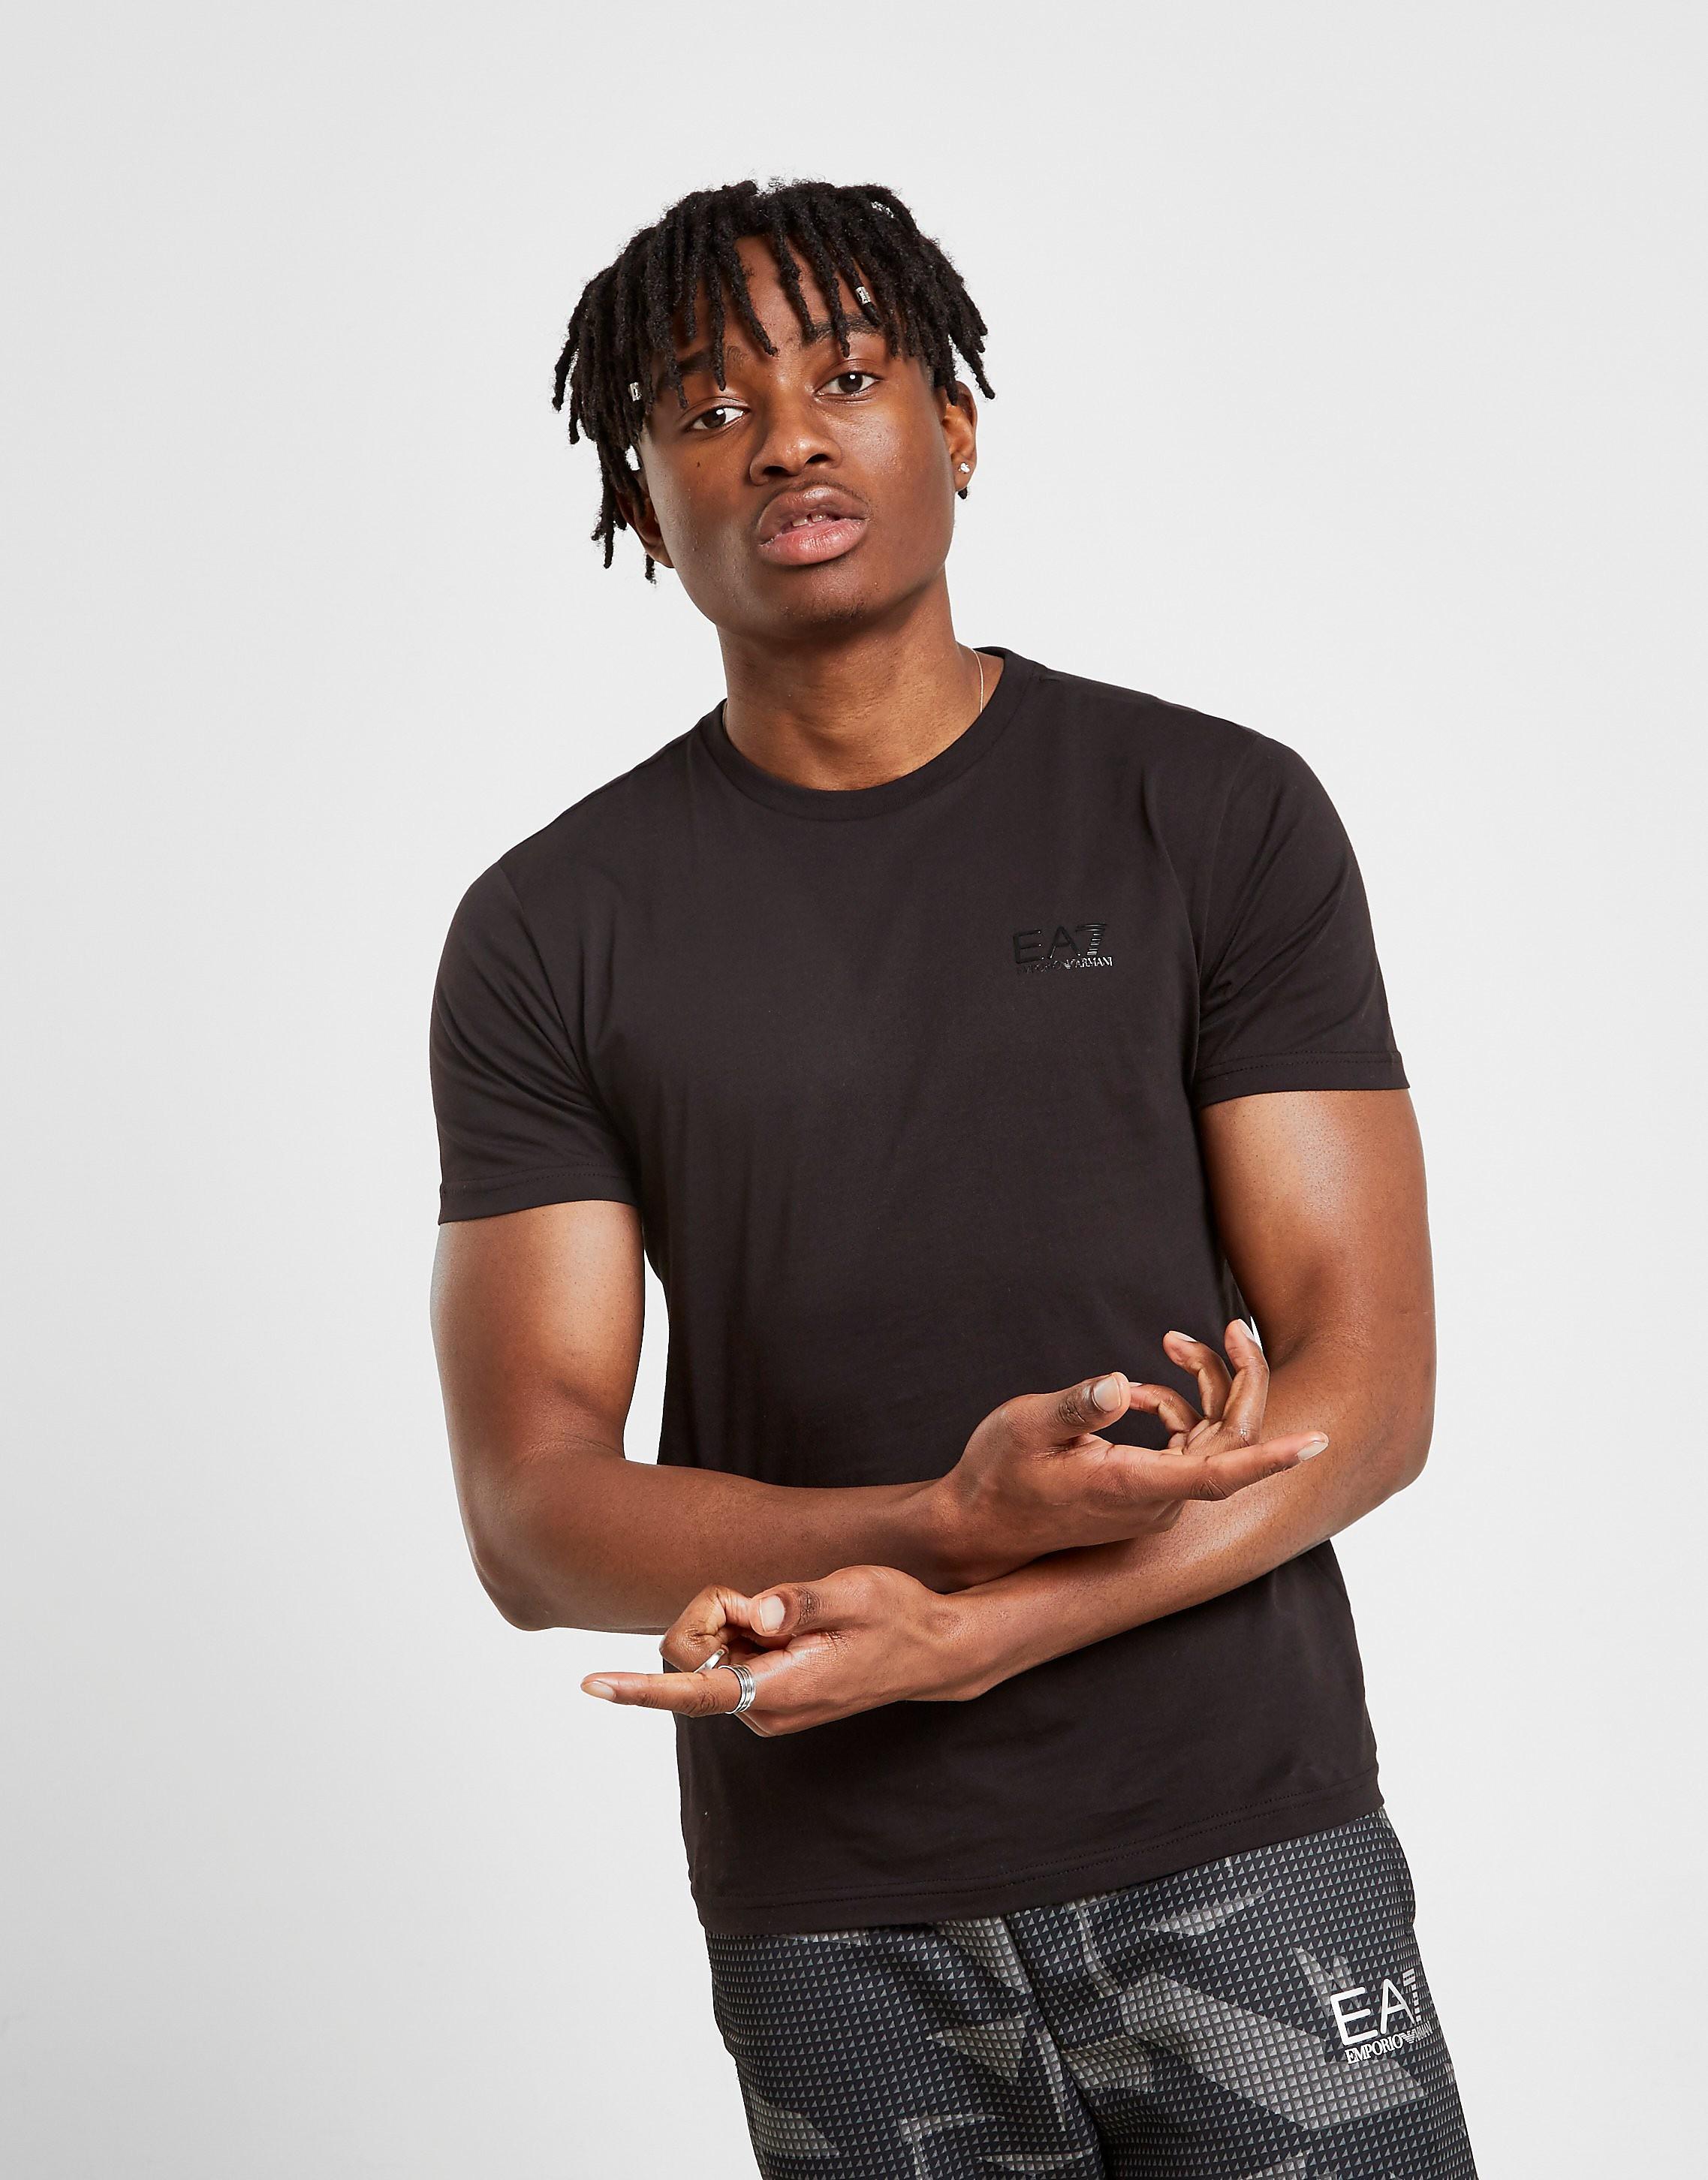 Emporio Armani EA7 Core Short Sleeve T-Shirt Heren - Zwart - Heren